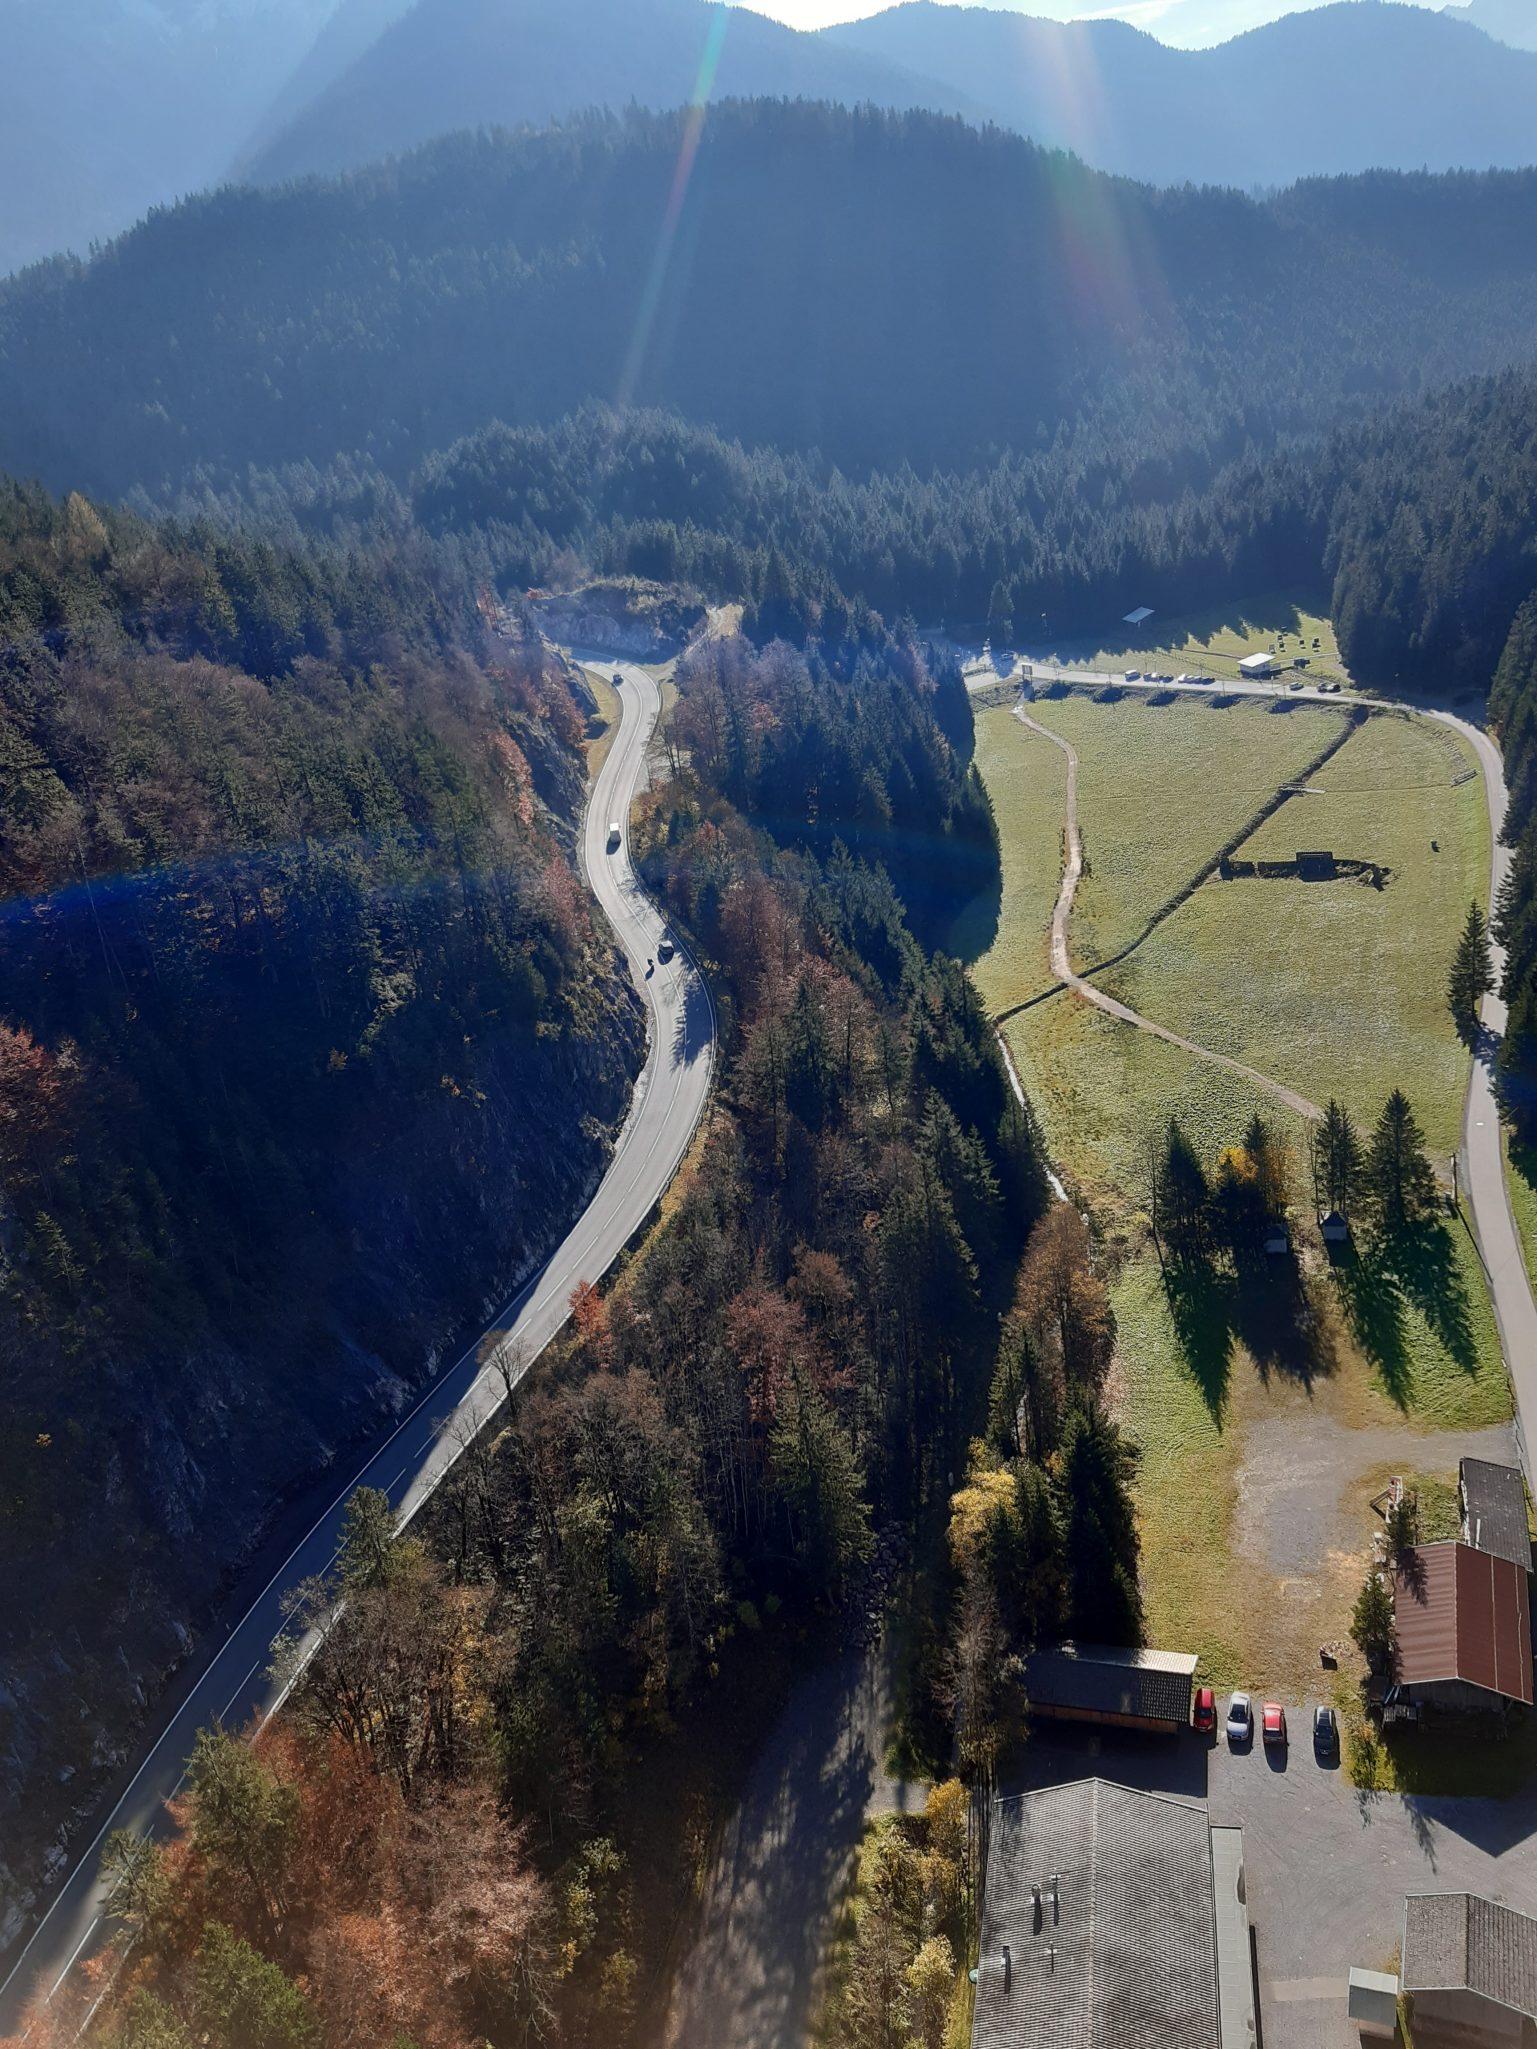 Fußgängerhängebrücke Reutte Aussicht in das Tal